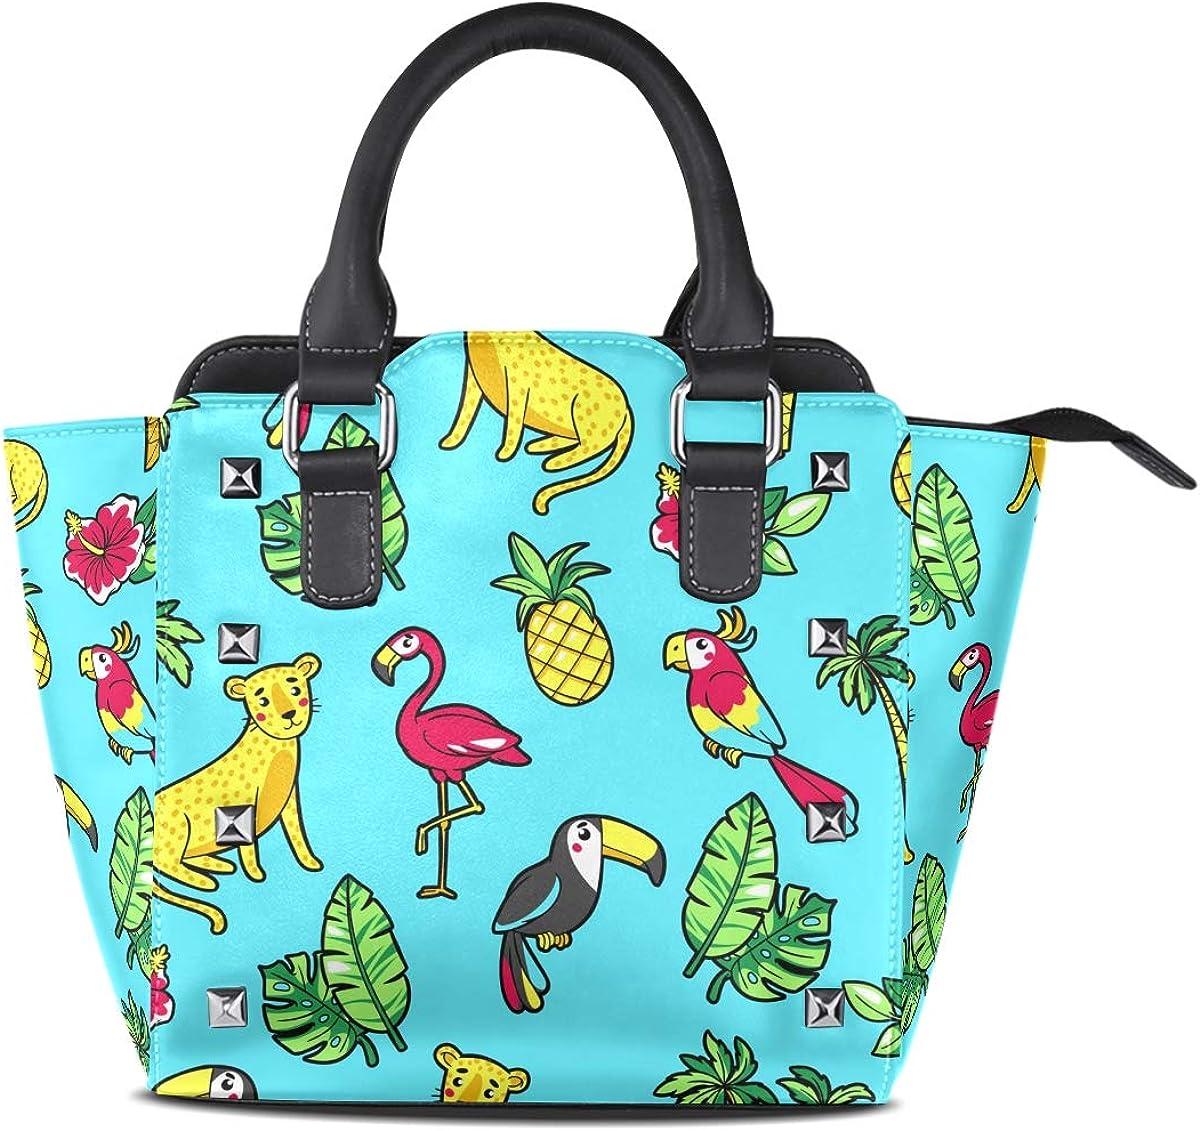 Womens Top Handle Satchel Handbag Flamingo Toucan Parrot Ladies PU Leather Shoulder Bag Crossbody Bag